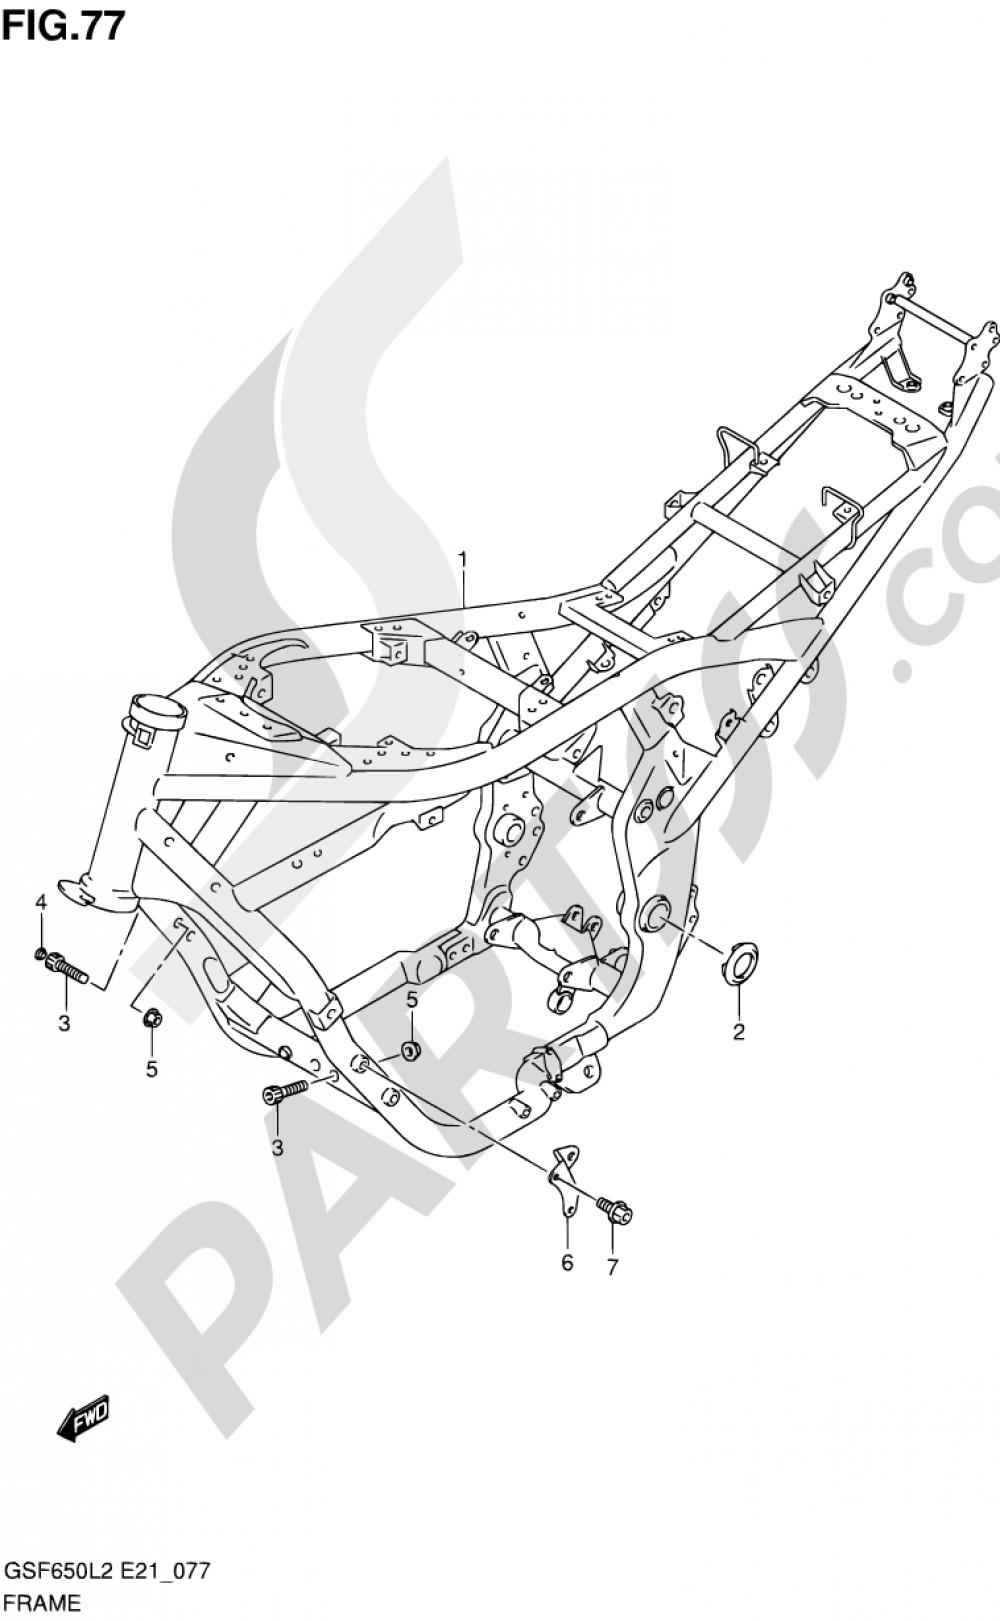 77 - FRAME (GSF650UL2 E21) Suzuki BANDIT GSF650A 2012